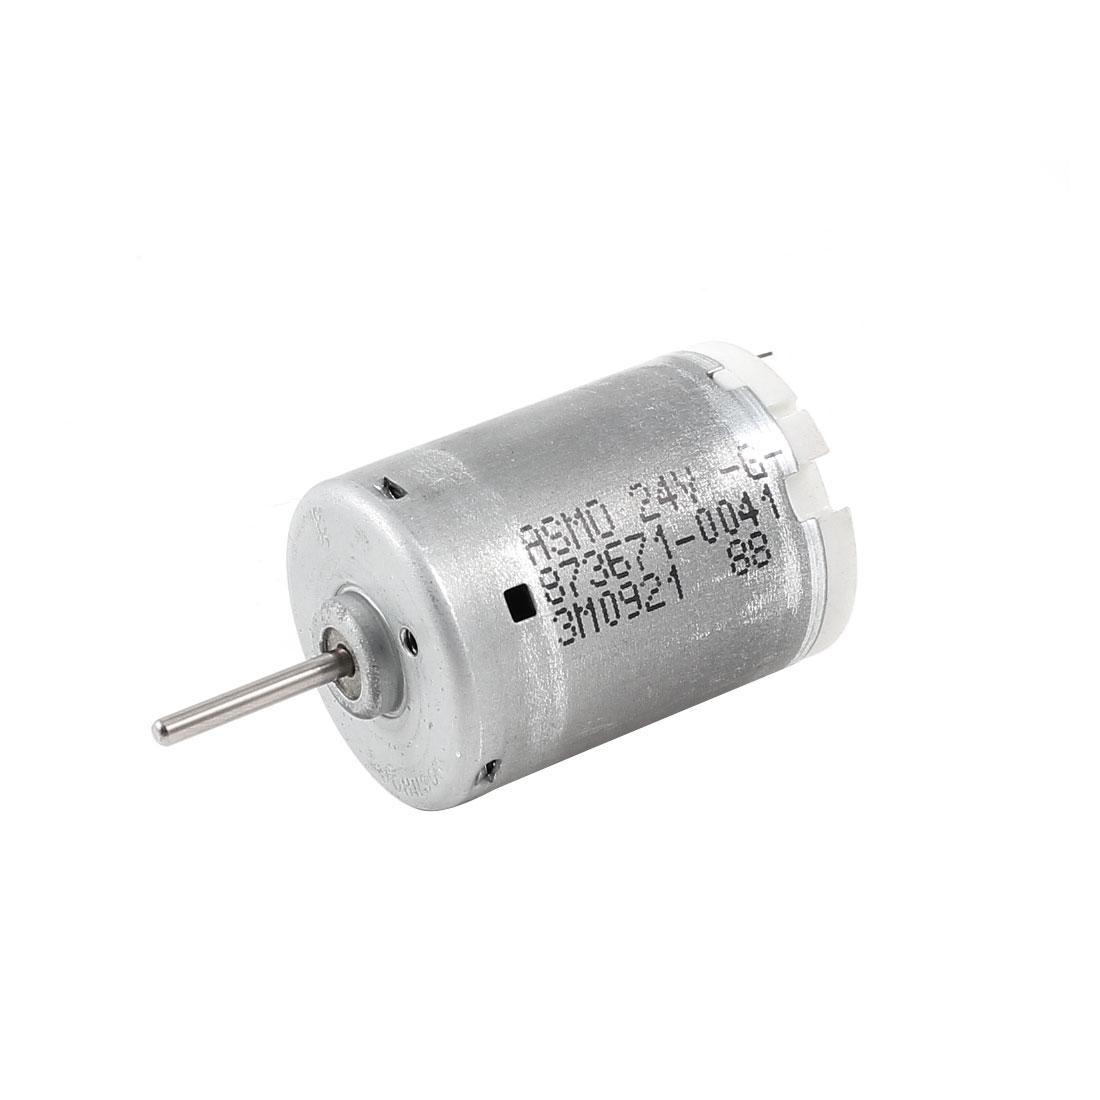 Silver-Tone-8960RPM-Speed-2-3mm-Shaft-High-Torque-Mini-Micro-Motor-DC-24V